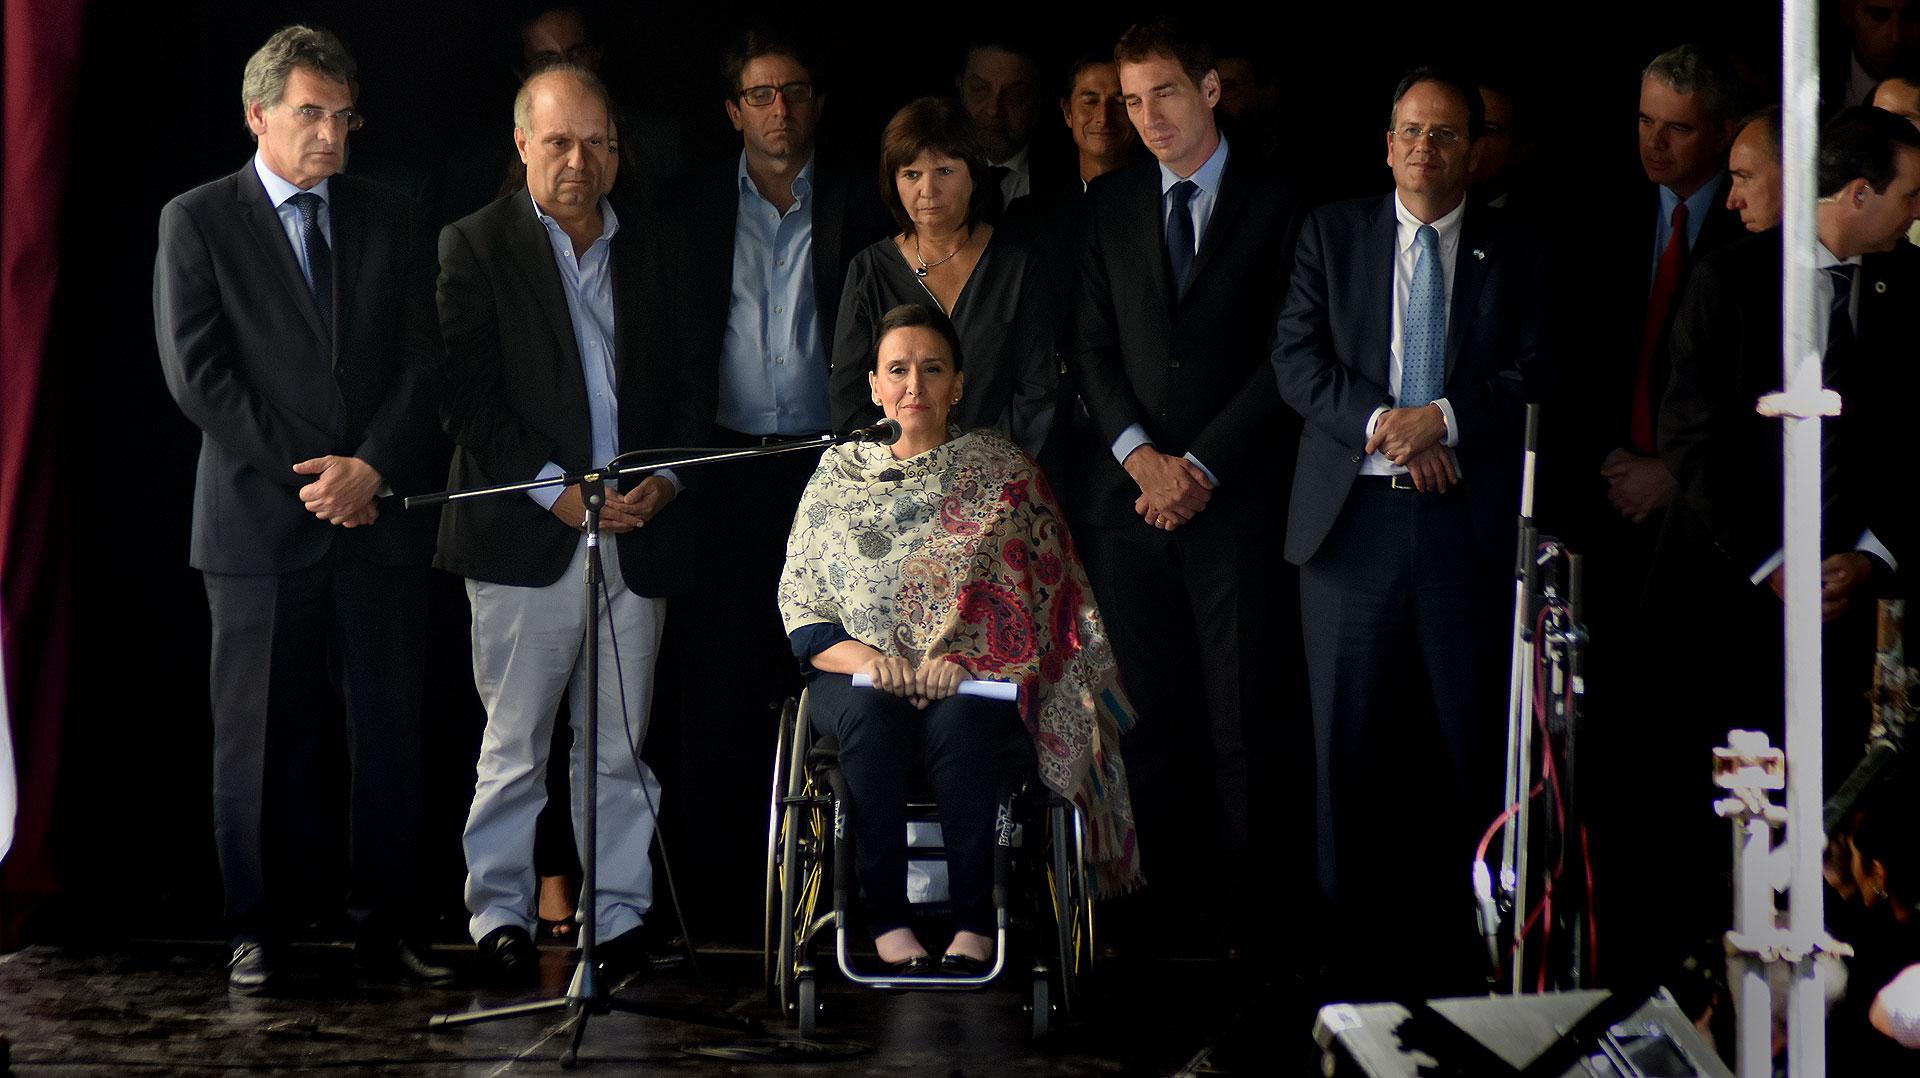 Claudio Avruj, Hernán Lombardi, Patricia Bullrich, Gabriela Michetti, Diego Santilli y el embajador de Israel, Ilán Sztulman